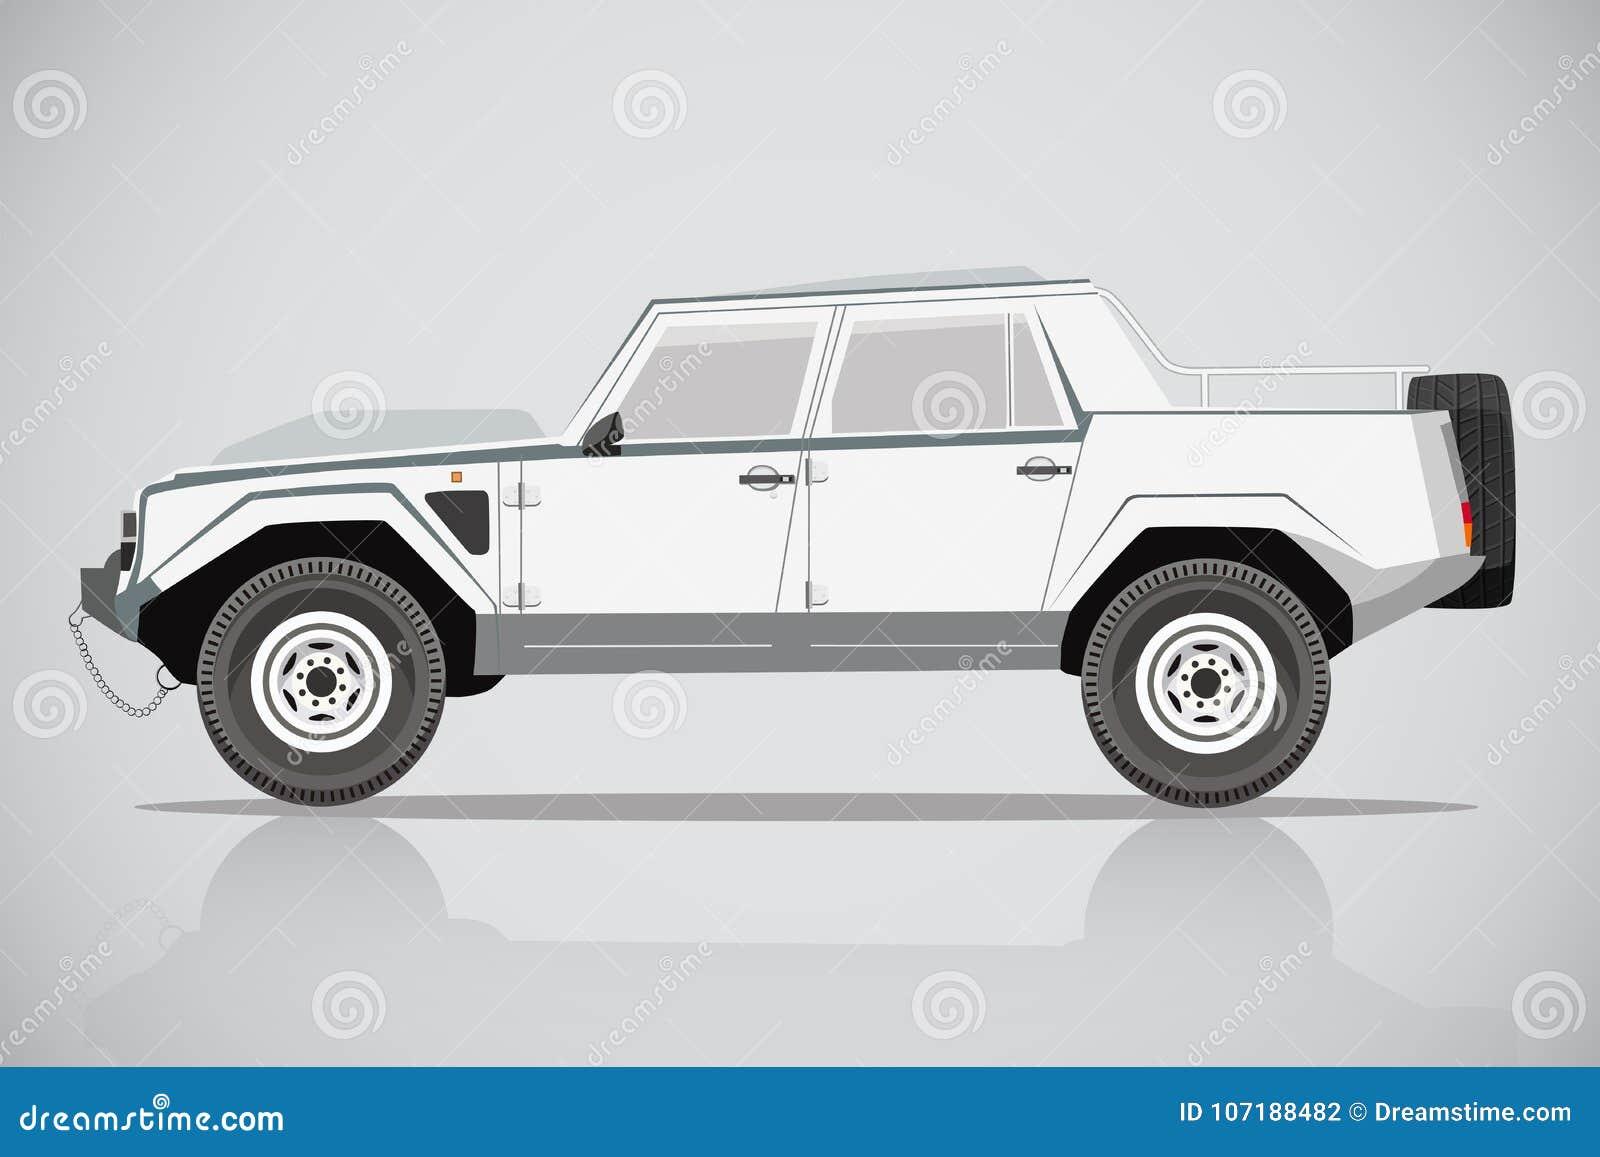 Lamborghini Car Suv Side View Stock Vector Illustration Of